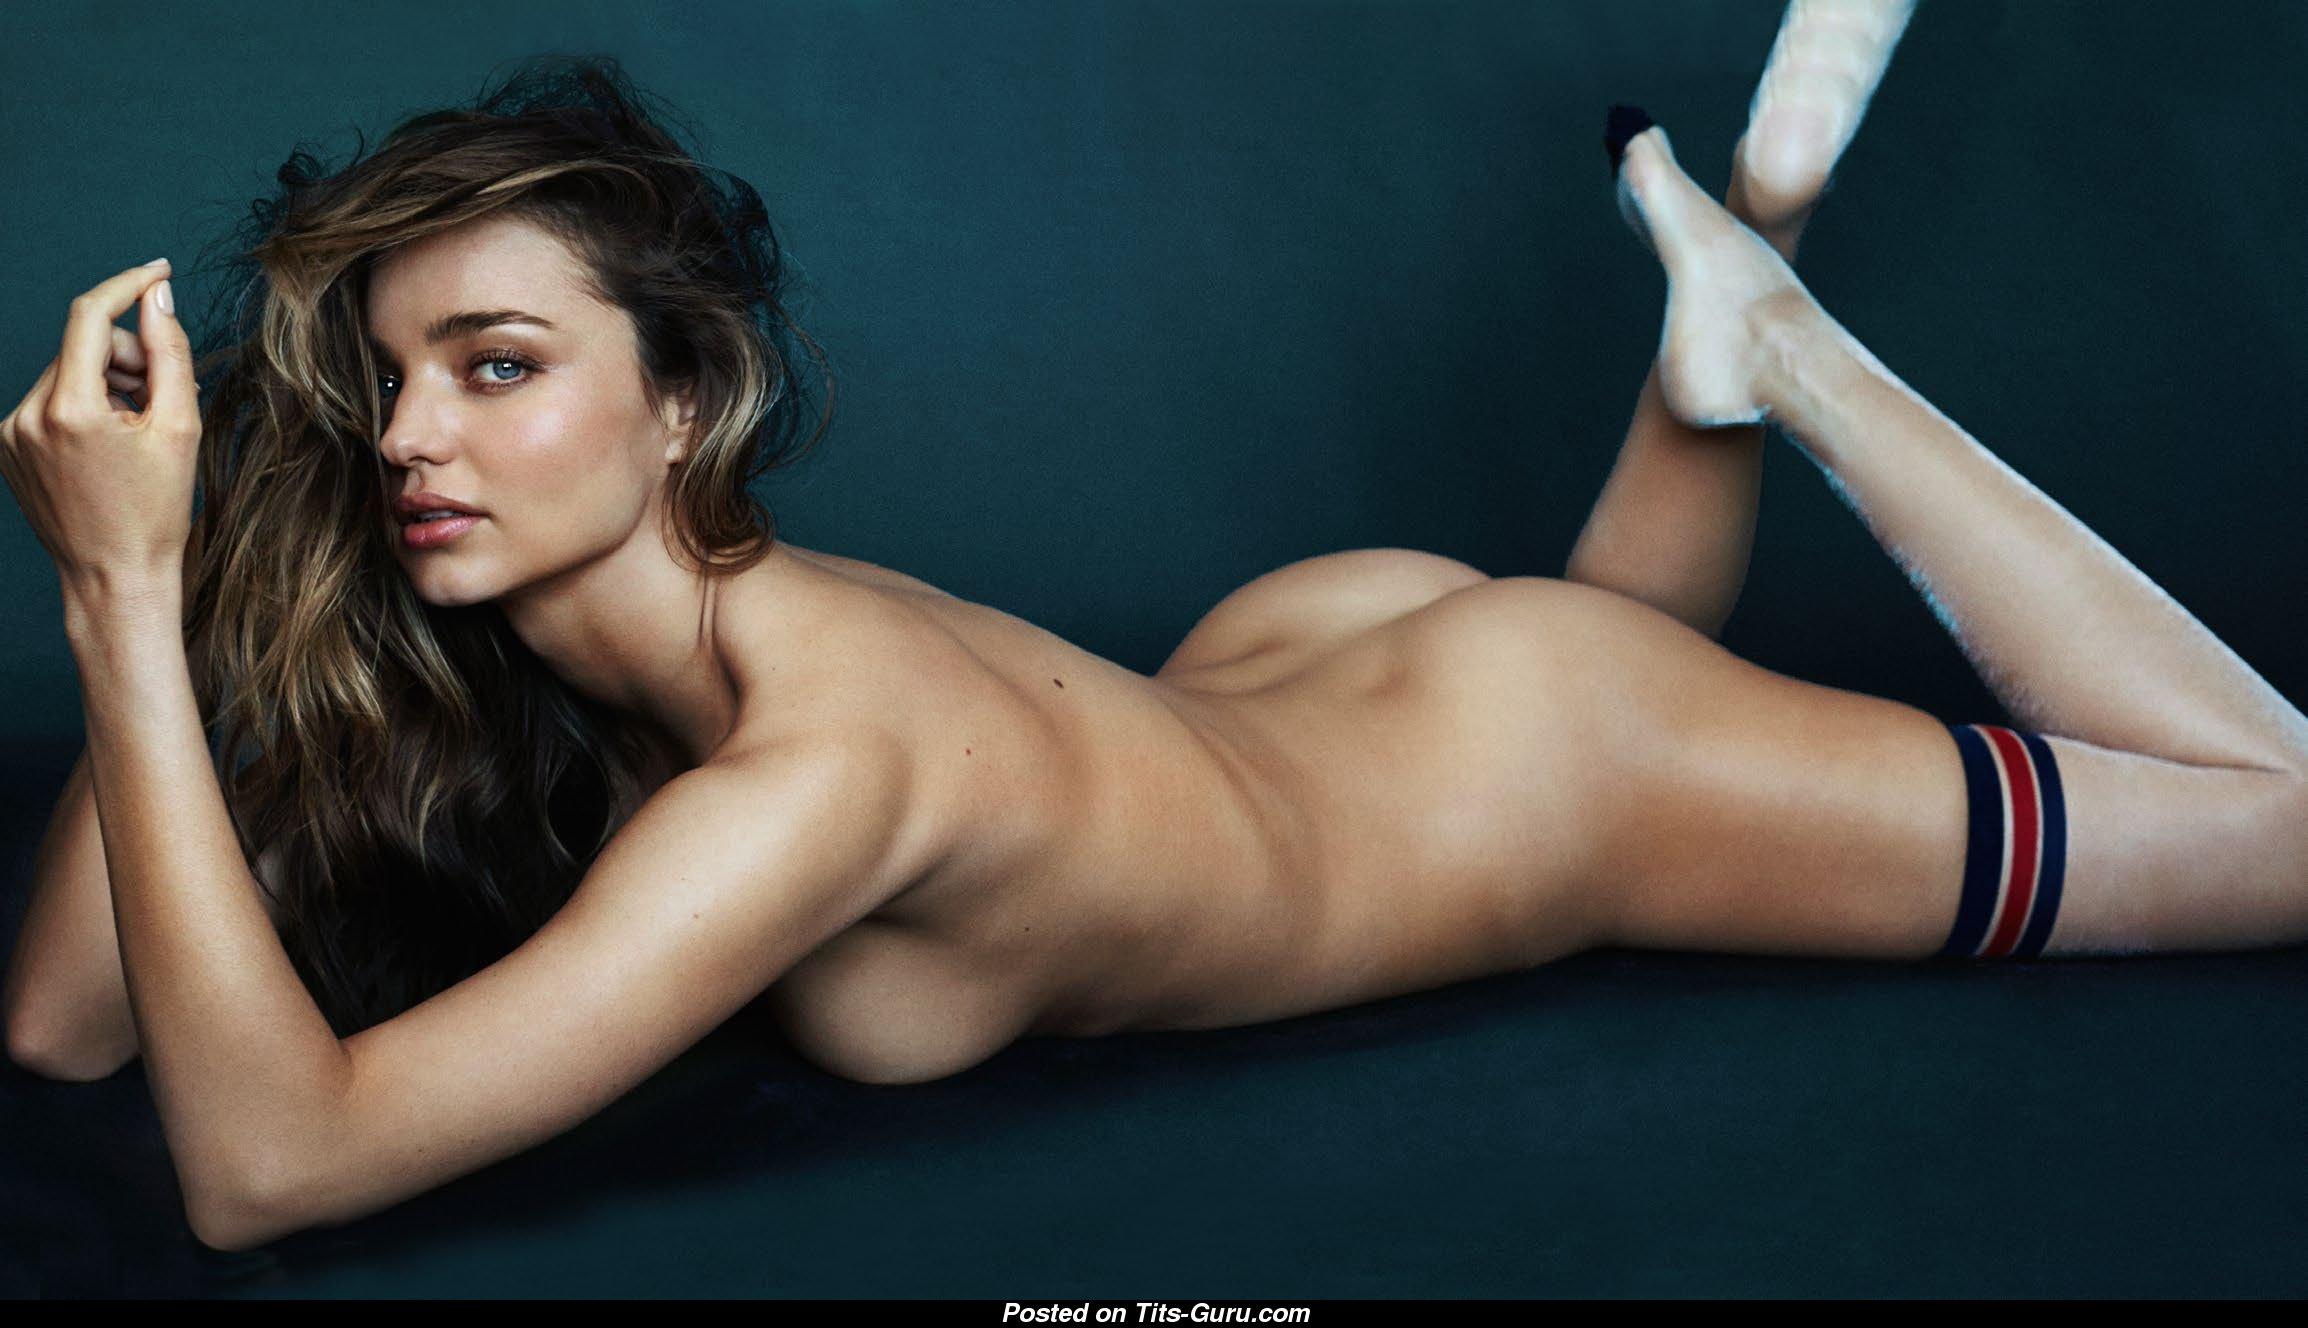 XXX Miranda Kerr nudes (82 photo), Pussy, Leaked, Boobs, legs 2019